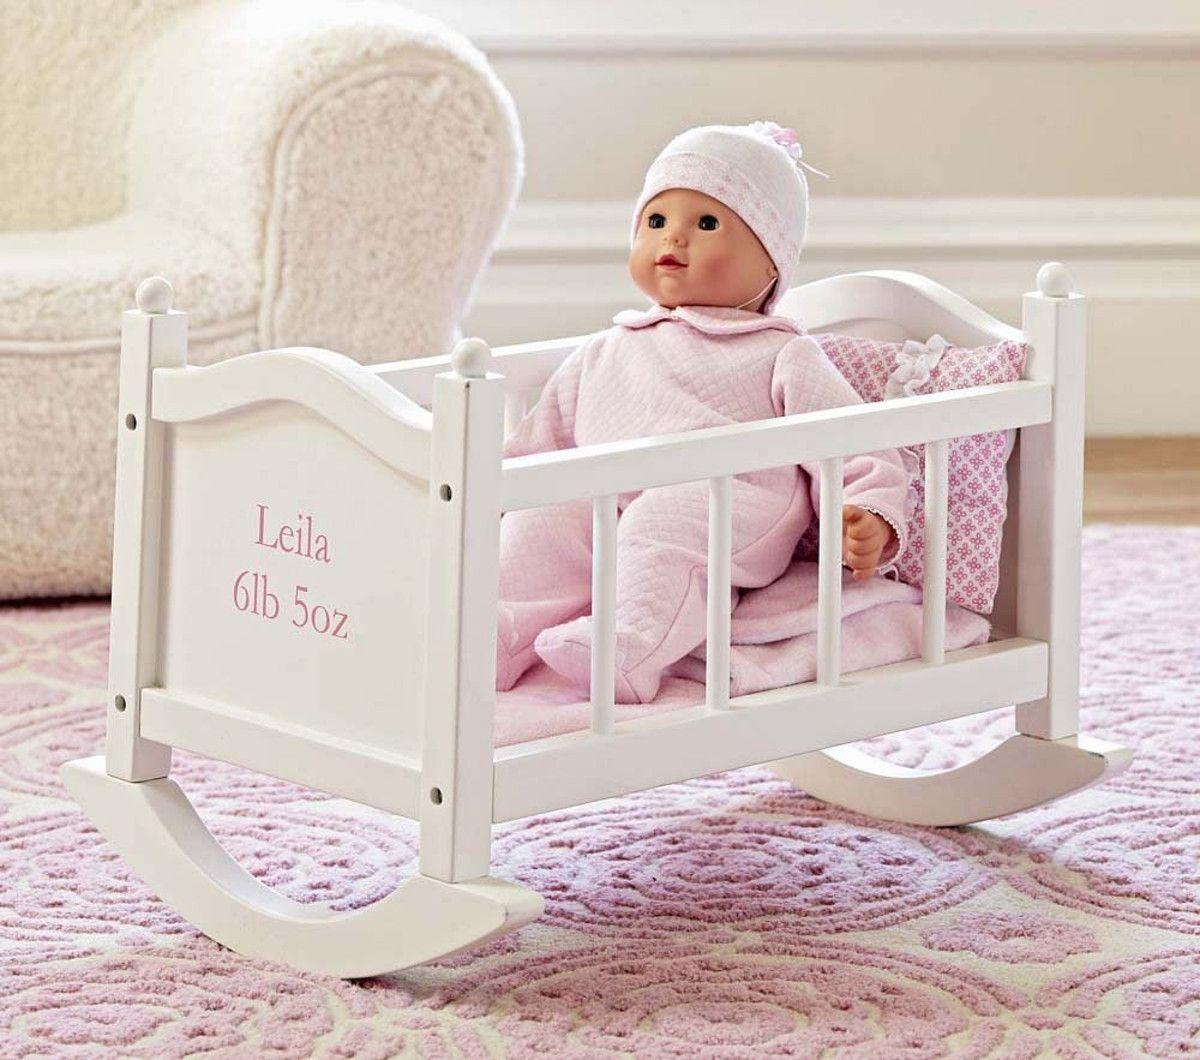 baby doll cradle gifts for juno pinterest baby dolls. Black Bedroom Furniture Sets. Home Design Ideas